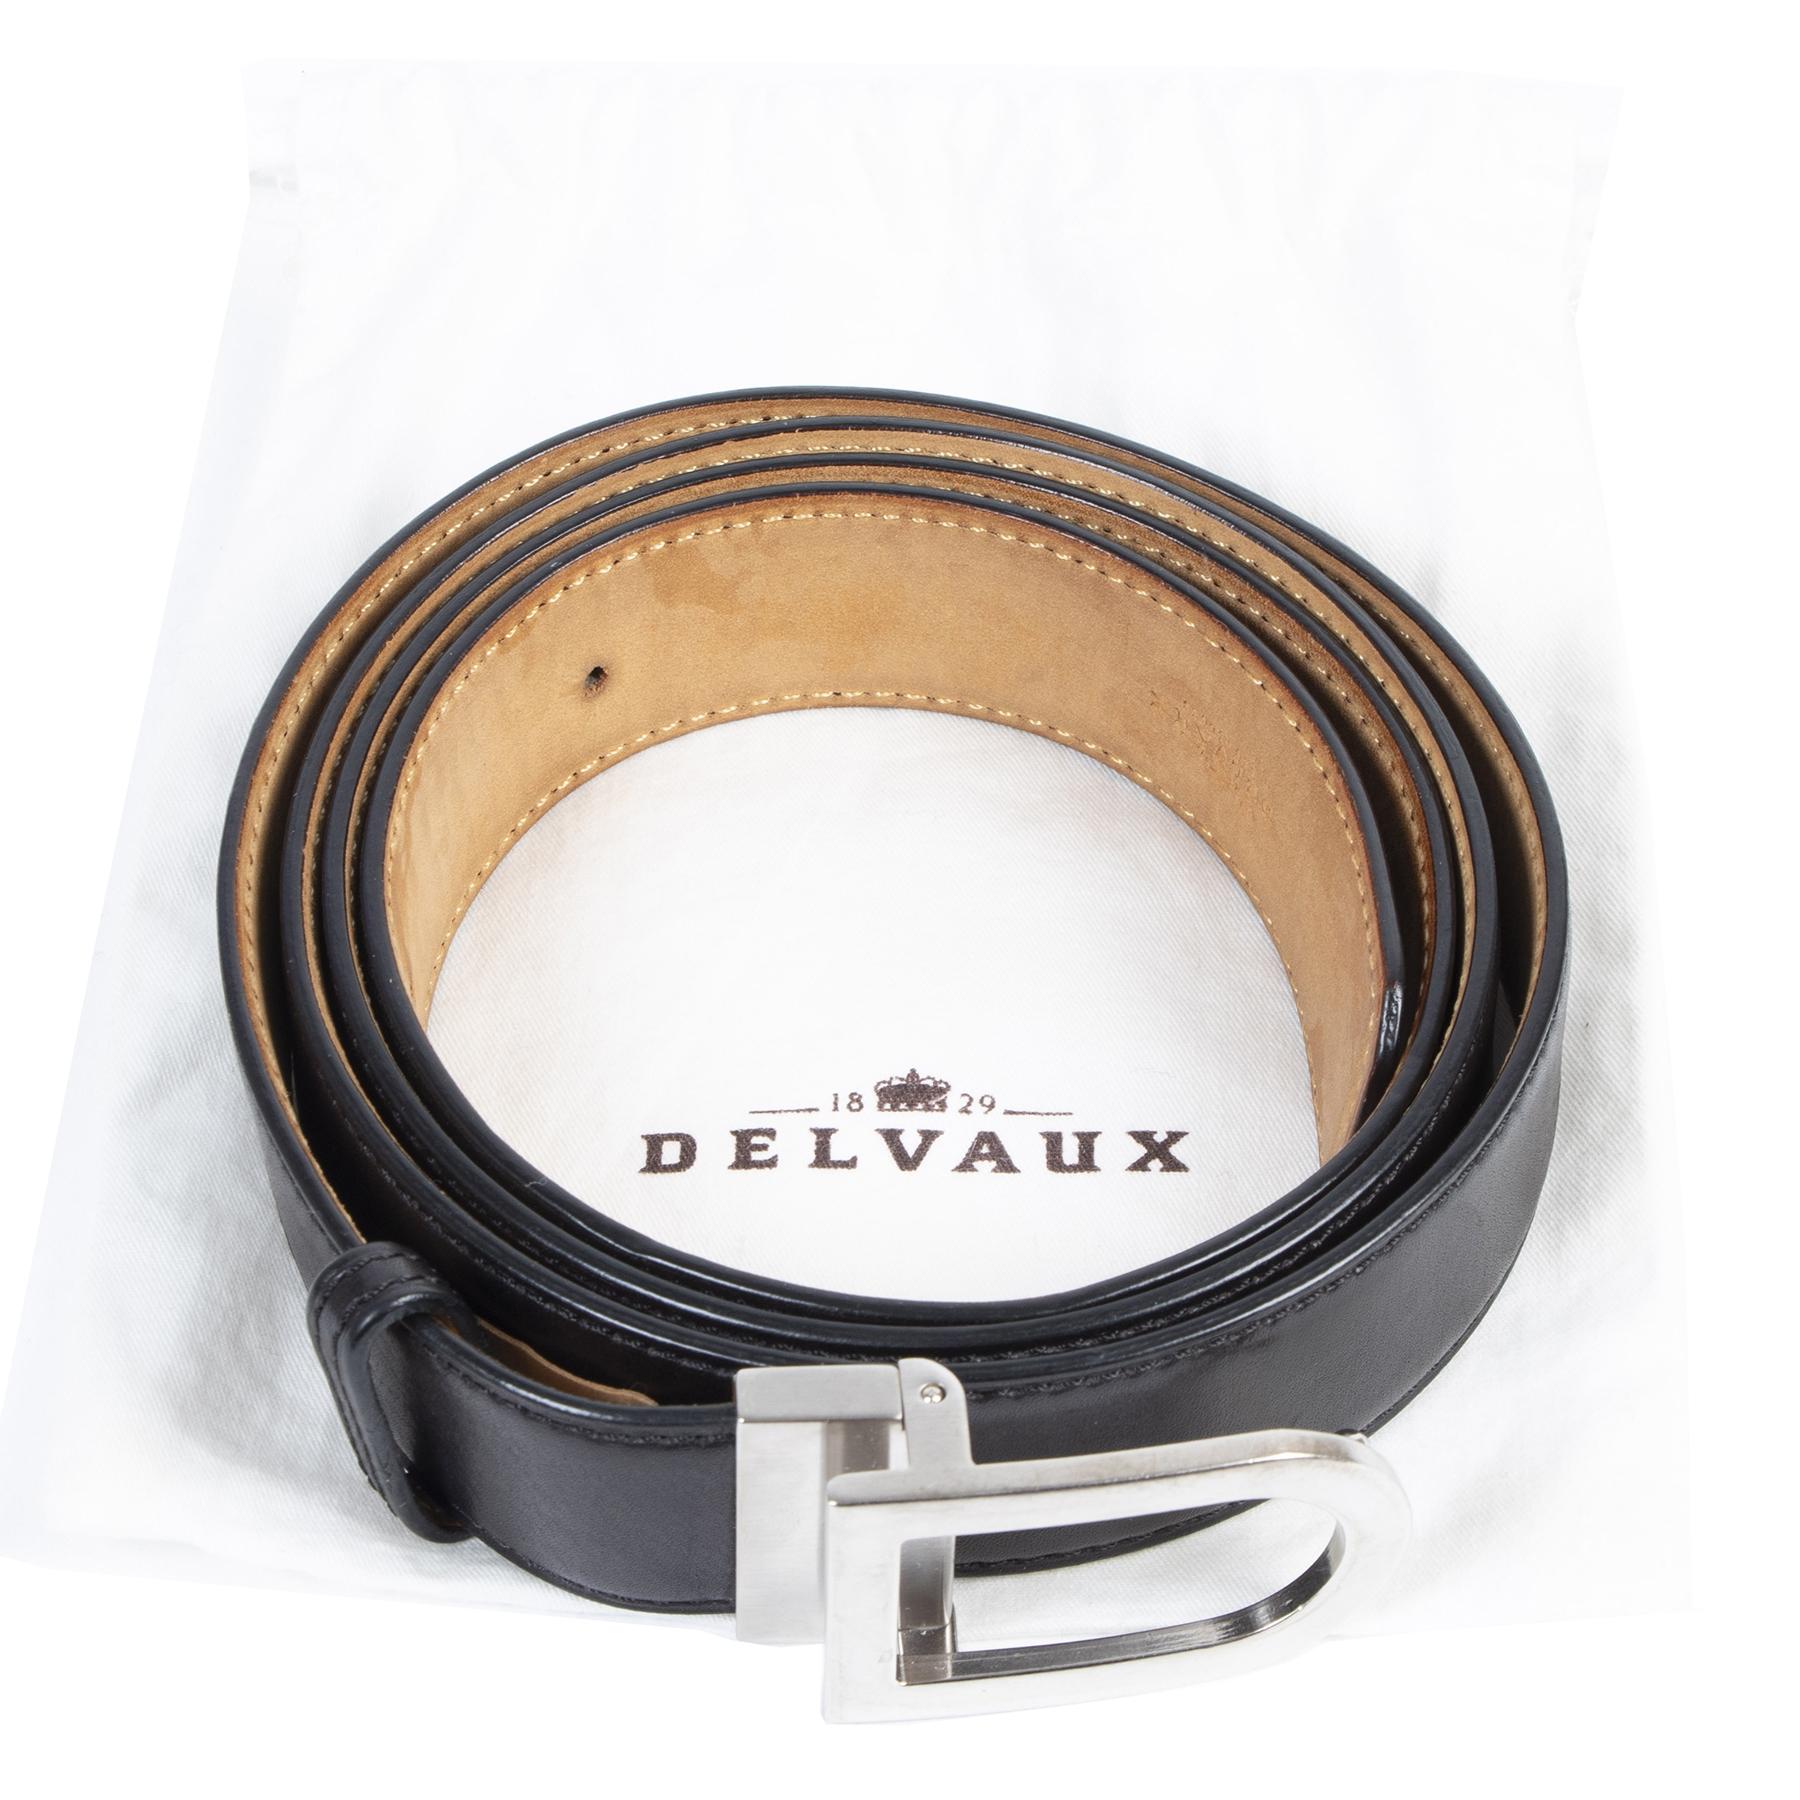 Authentic secondhand Delvaux Black Leather Silver D Belt - Size 120 designer accessories fashion luxury vintage webshop safe secure online shopping